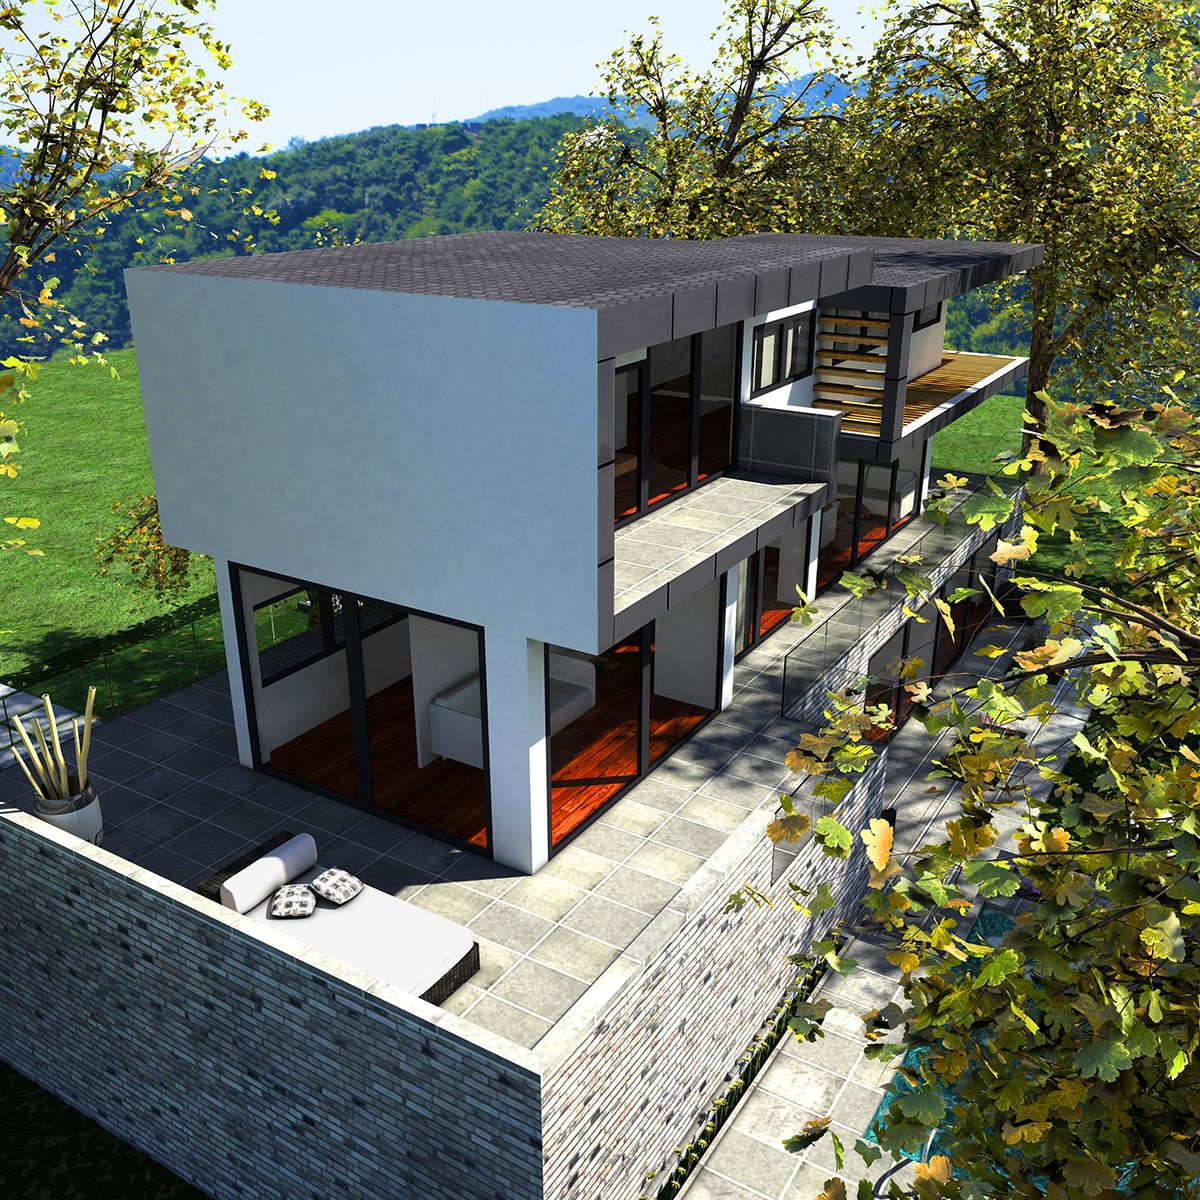 luxurious house 3d model fbx c4d ma mb other obj 164597